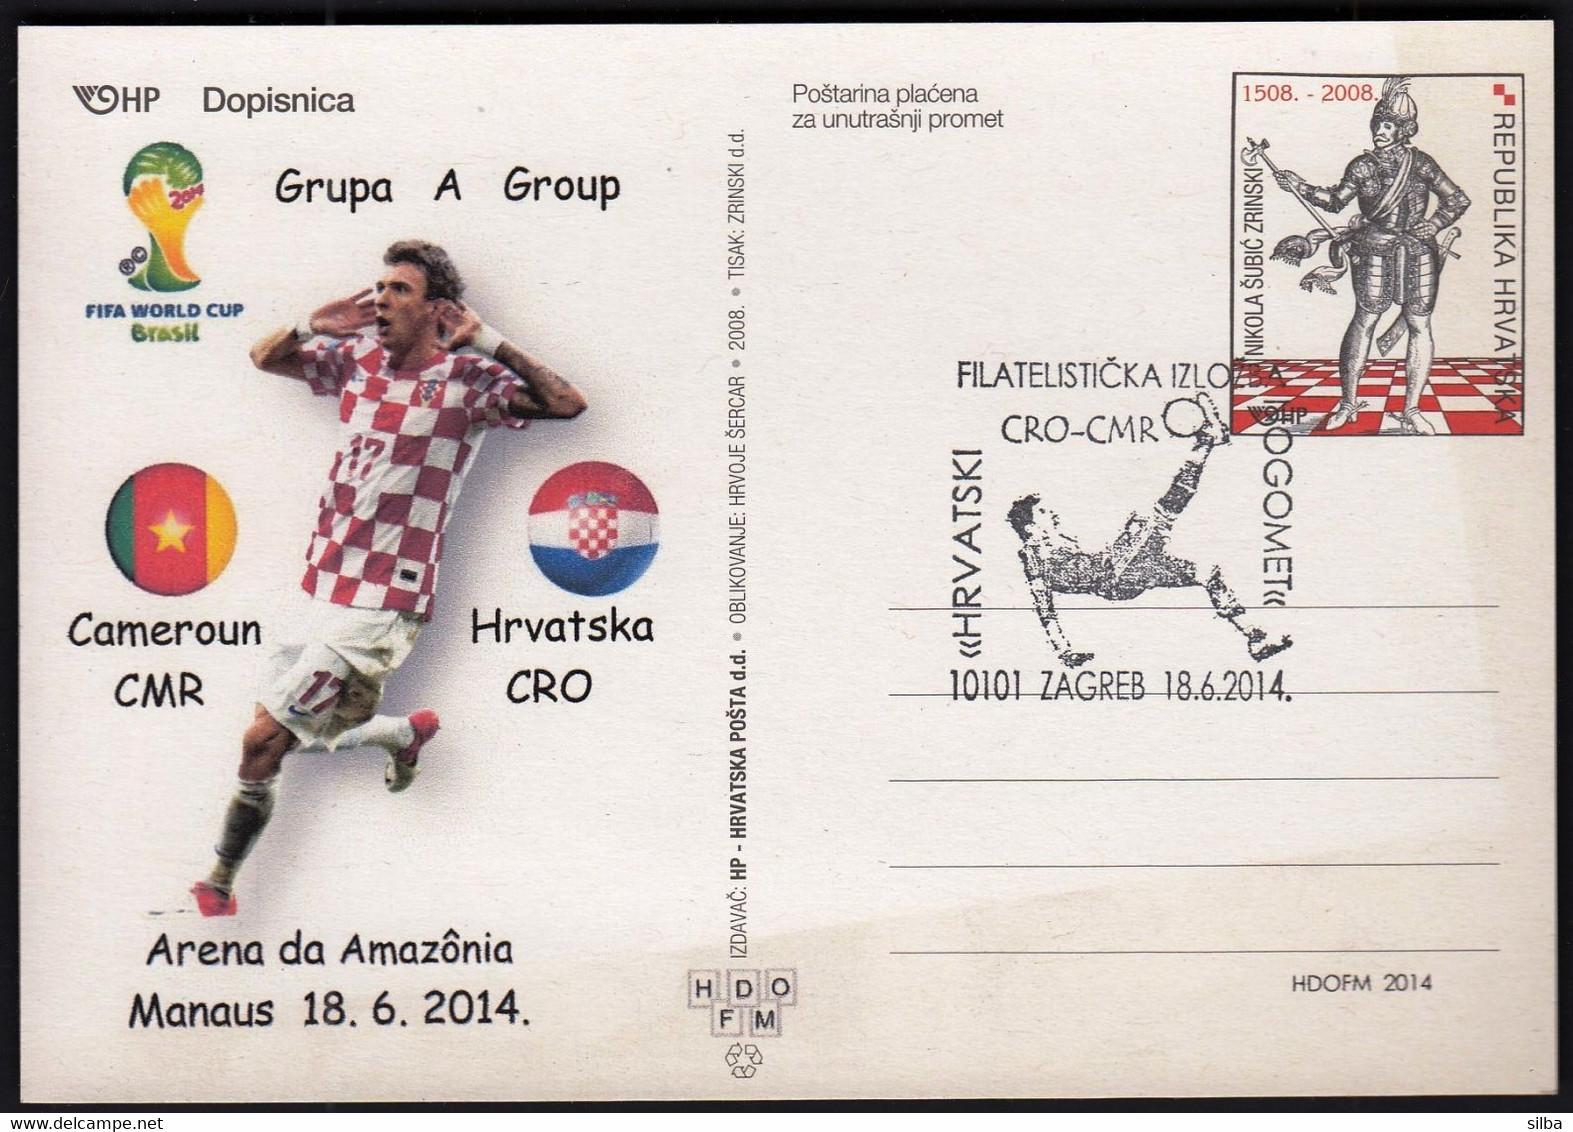 Croatia Zagreb 2014 / Soccer Football / World Championship Brazil 2014 / Ph. Ex. Croatian Football / Croatia - Cameroun - 2014 – Brasil